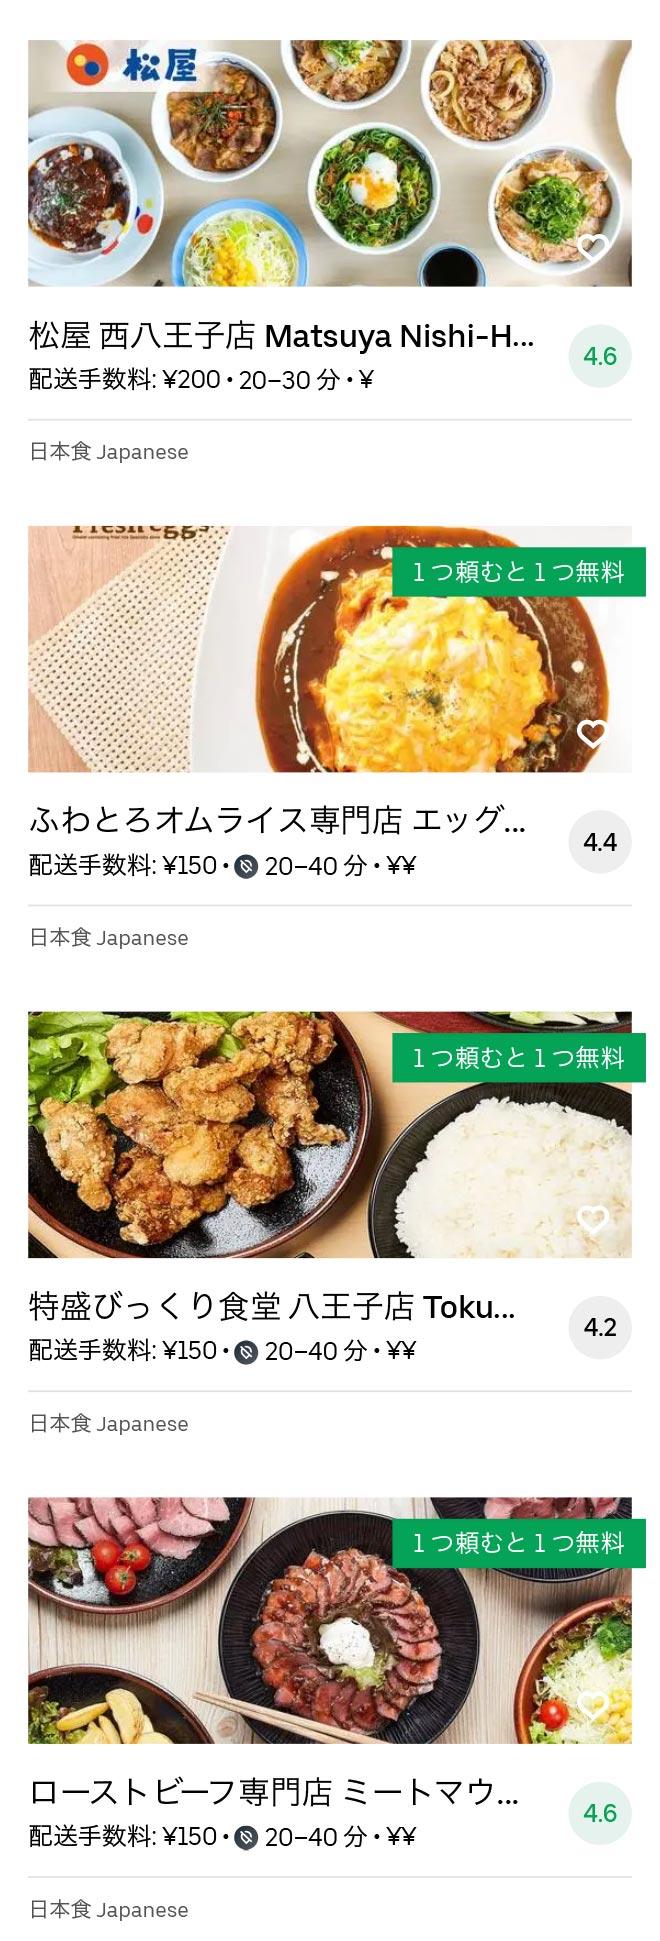 Nishi hatioji menu 2010 04